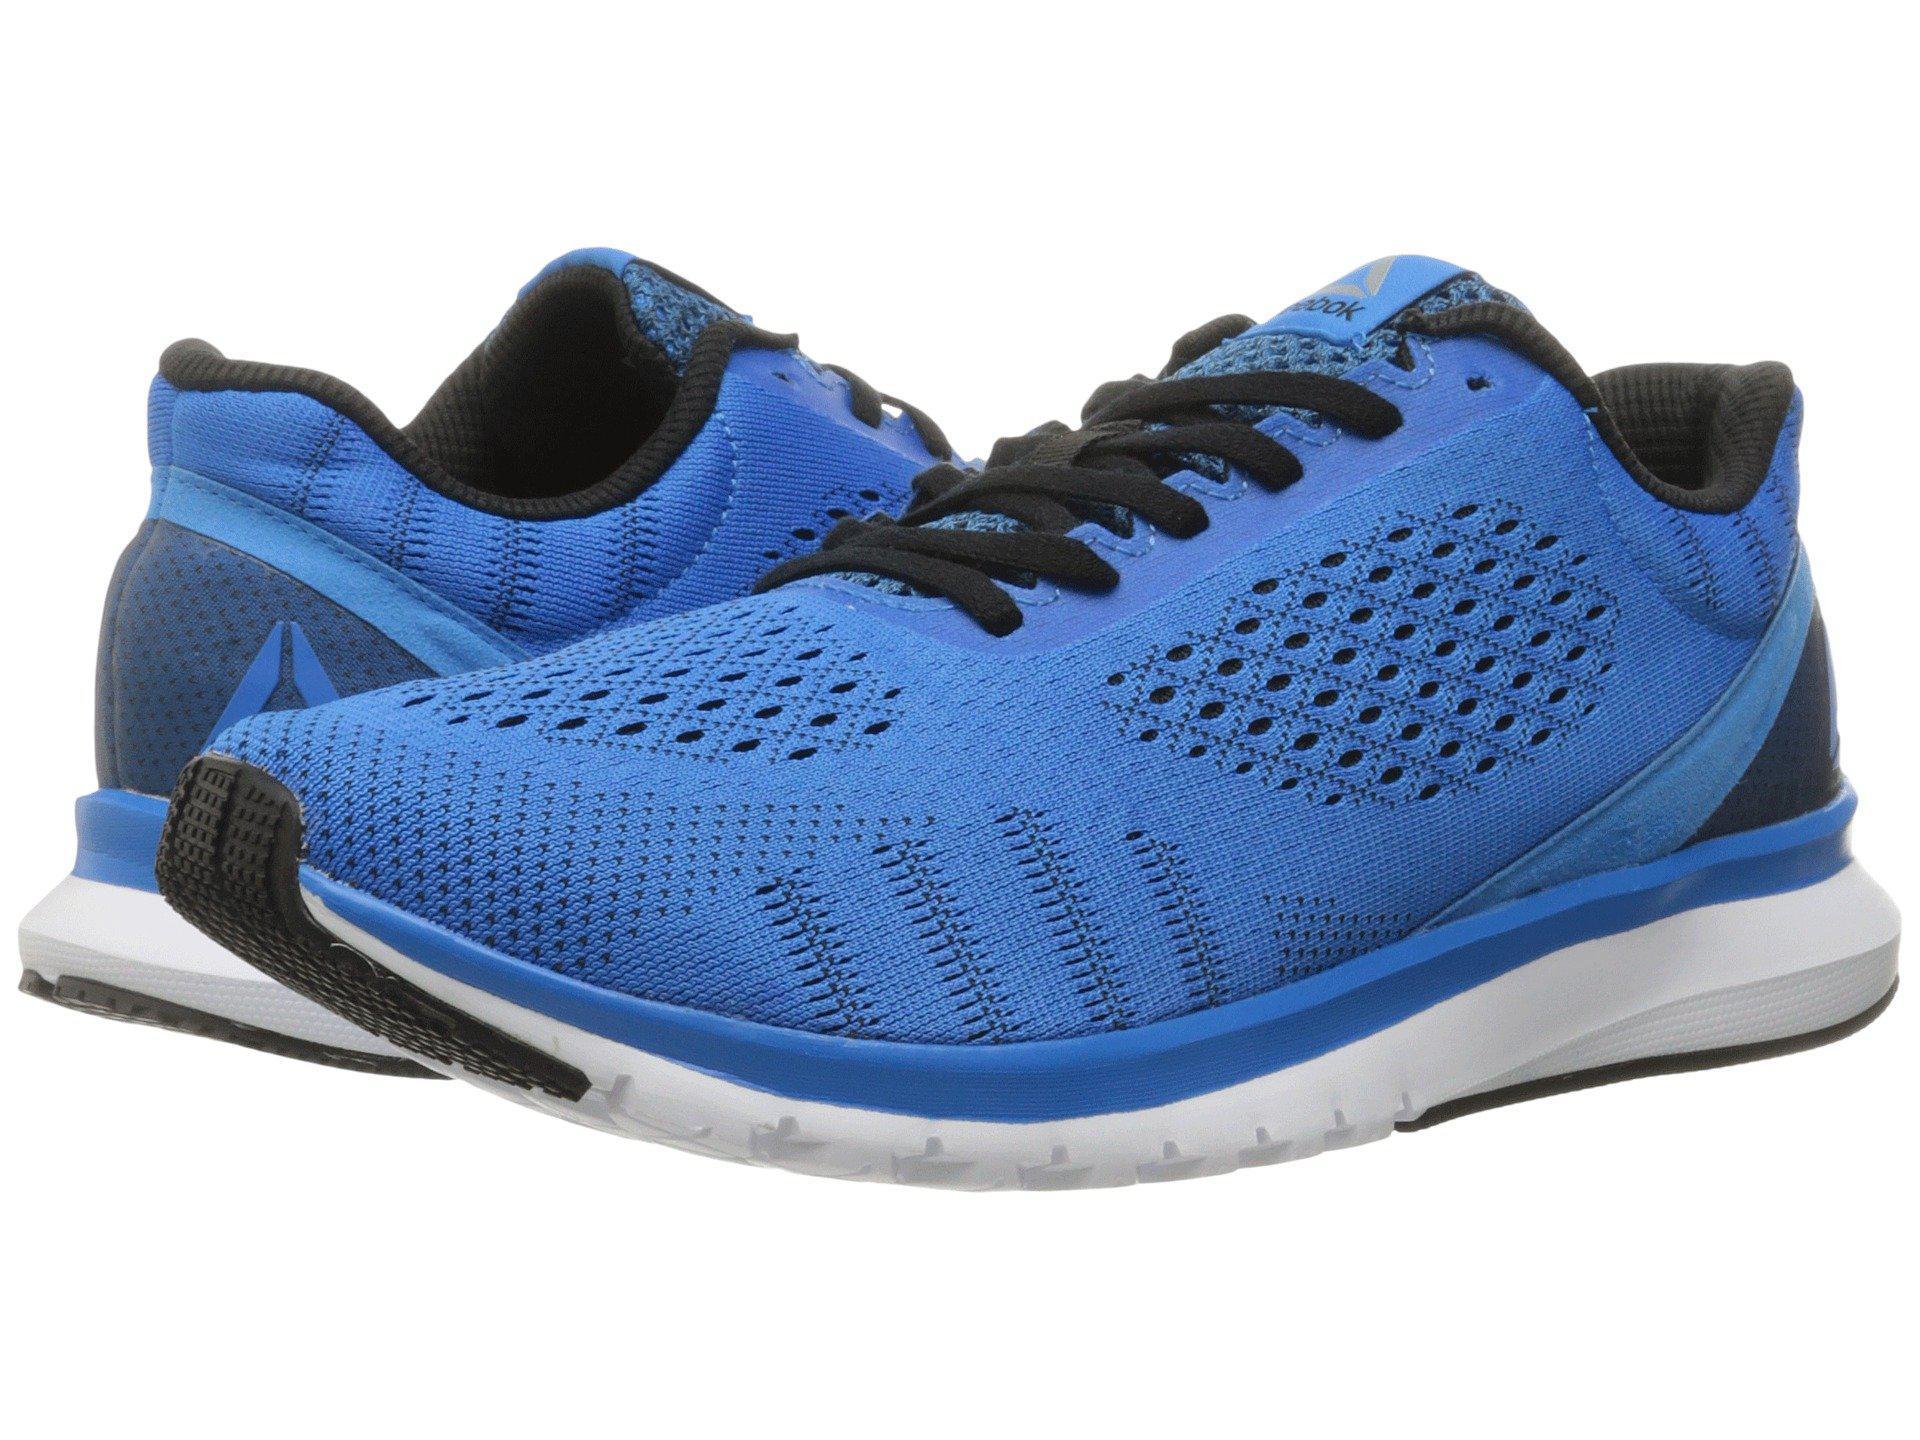 16fd77a255d738 Lyst - Reebok Print Run Smooth Ultk in Blue for Men